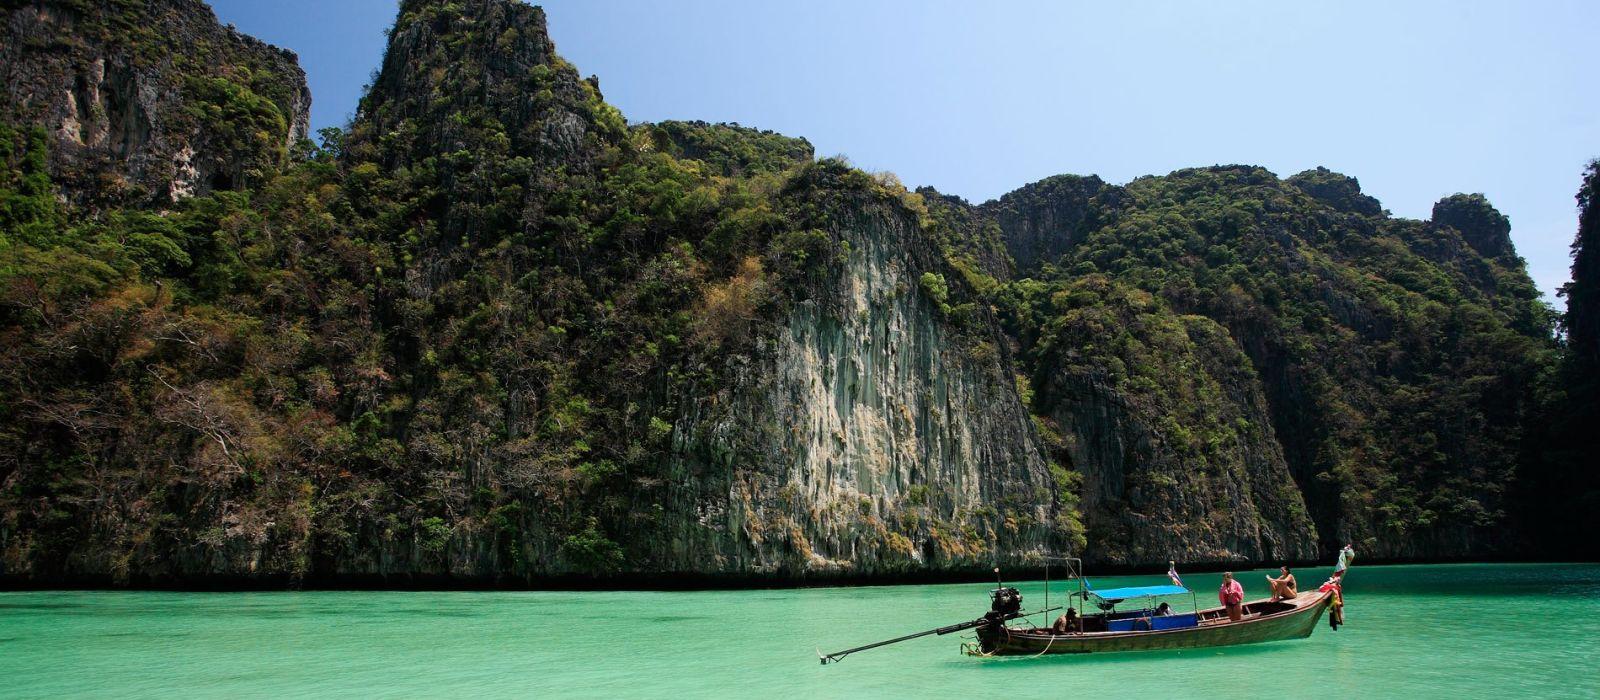 Reiseziel Koh Phi Phi Thailand